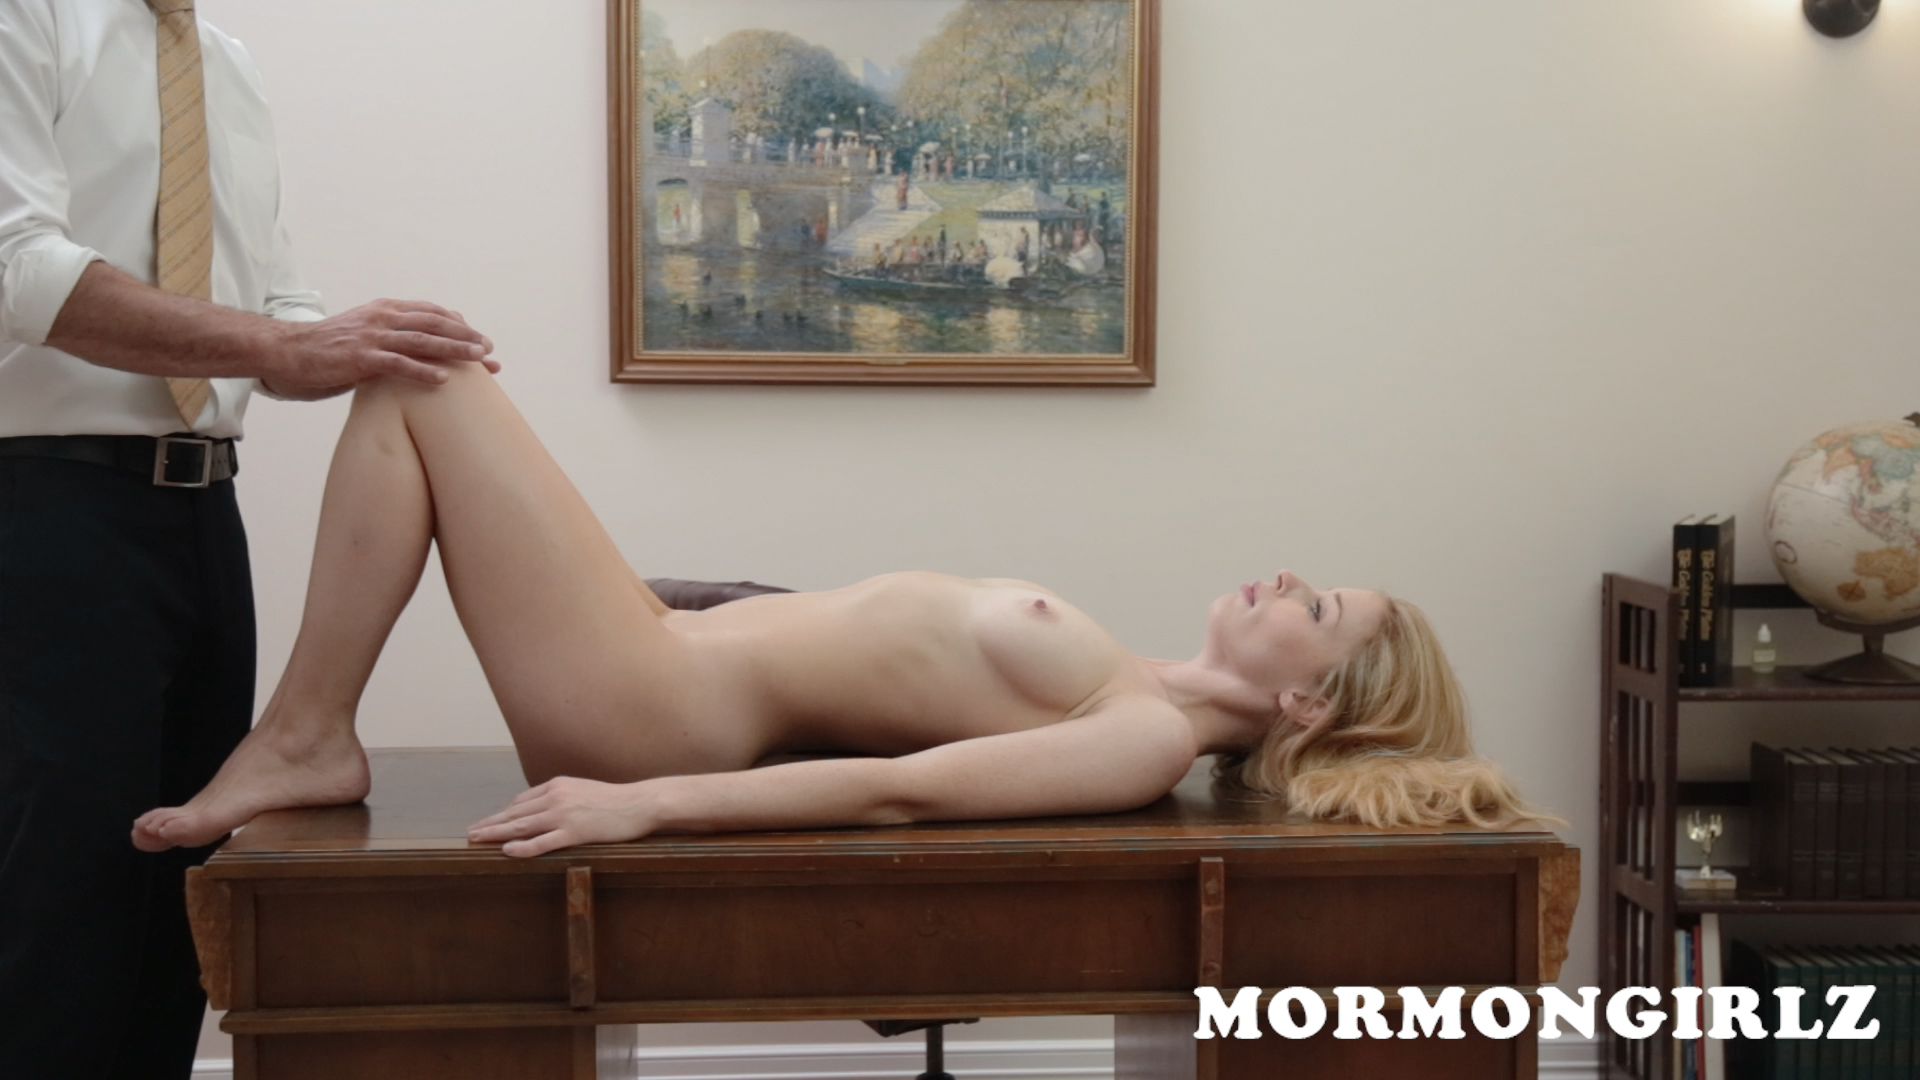 mormongirlz_70b_09